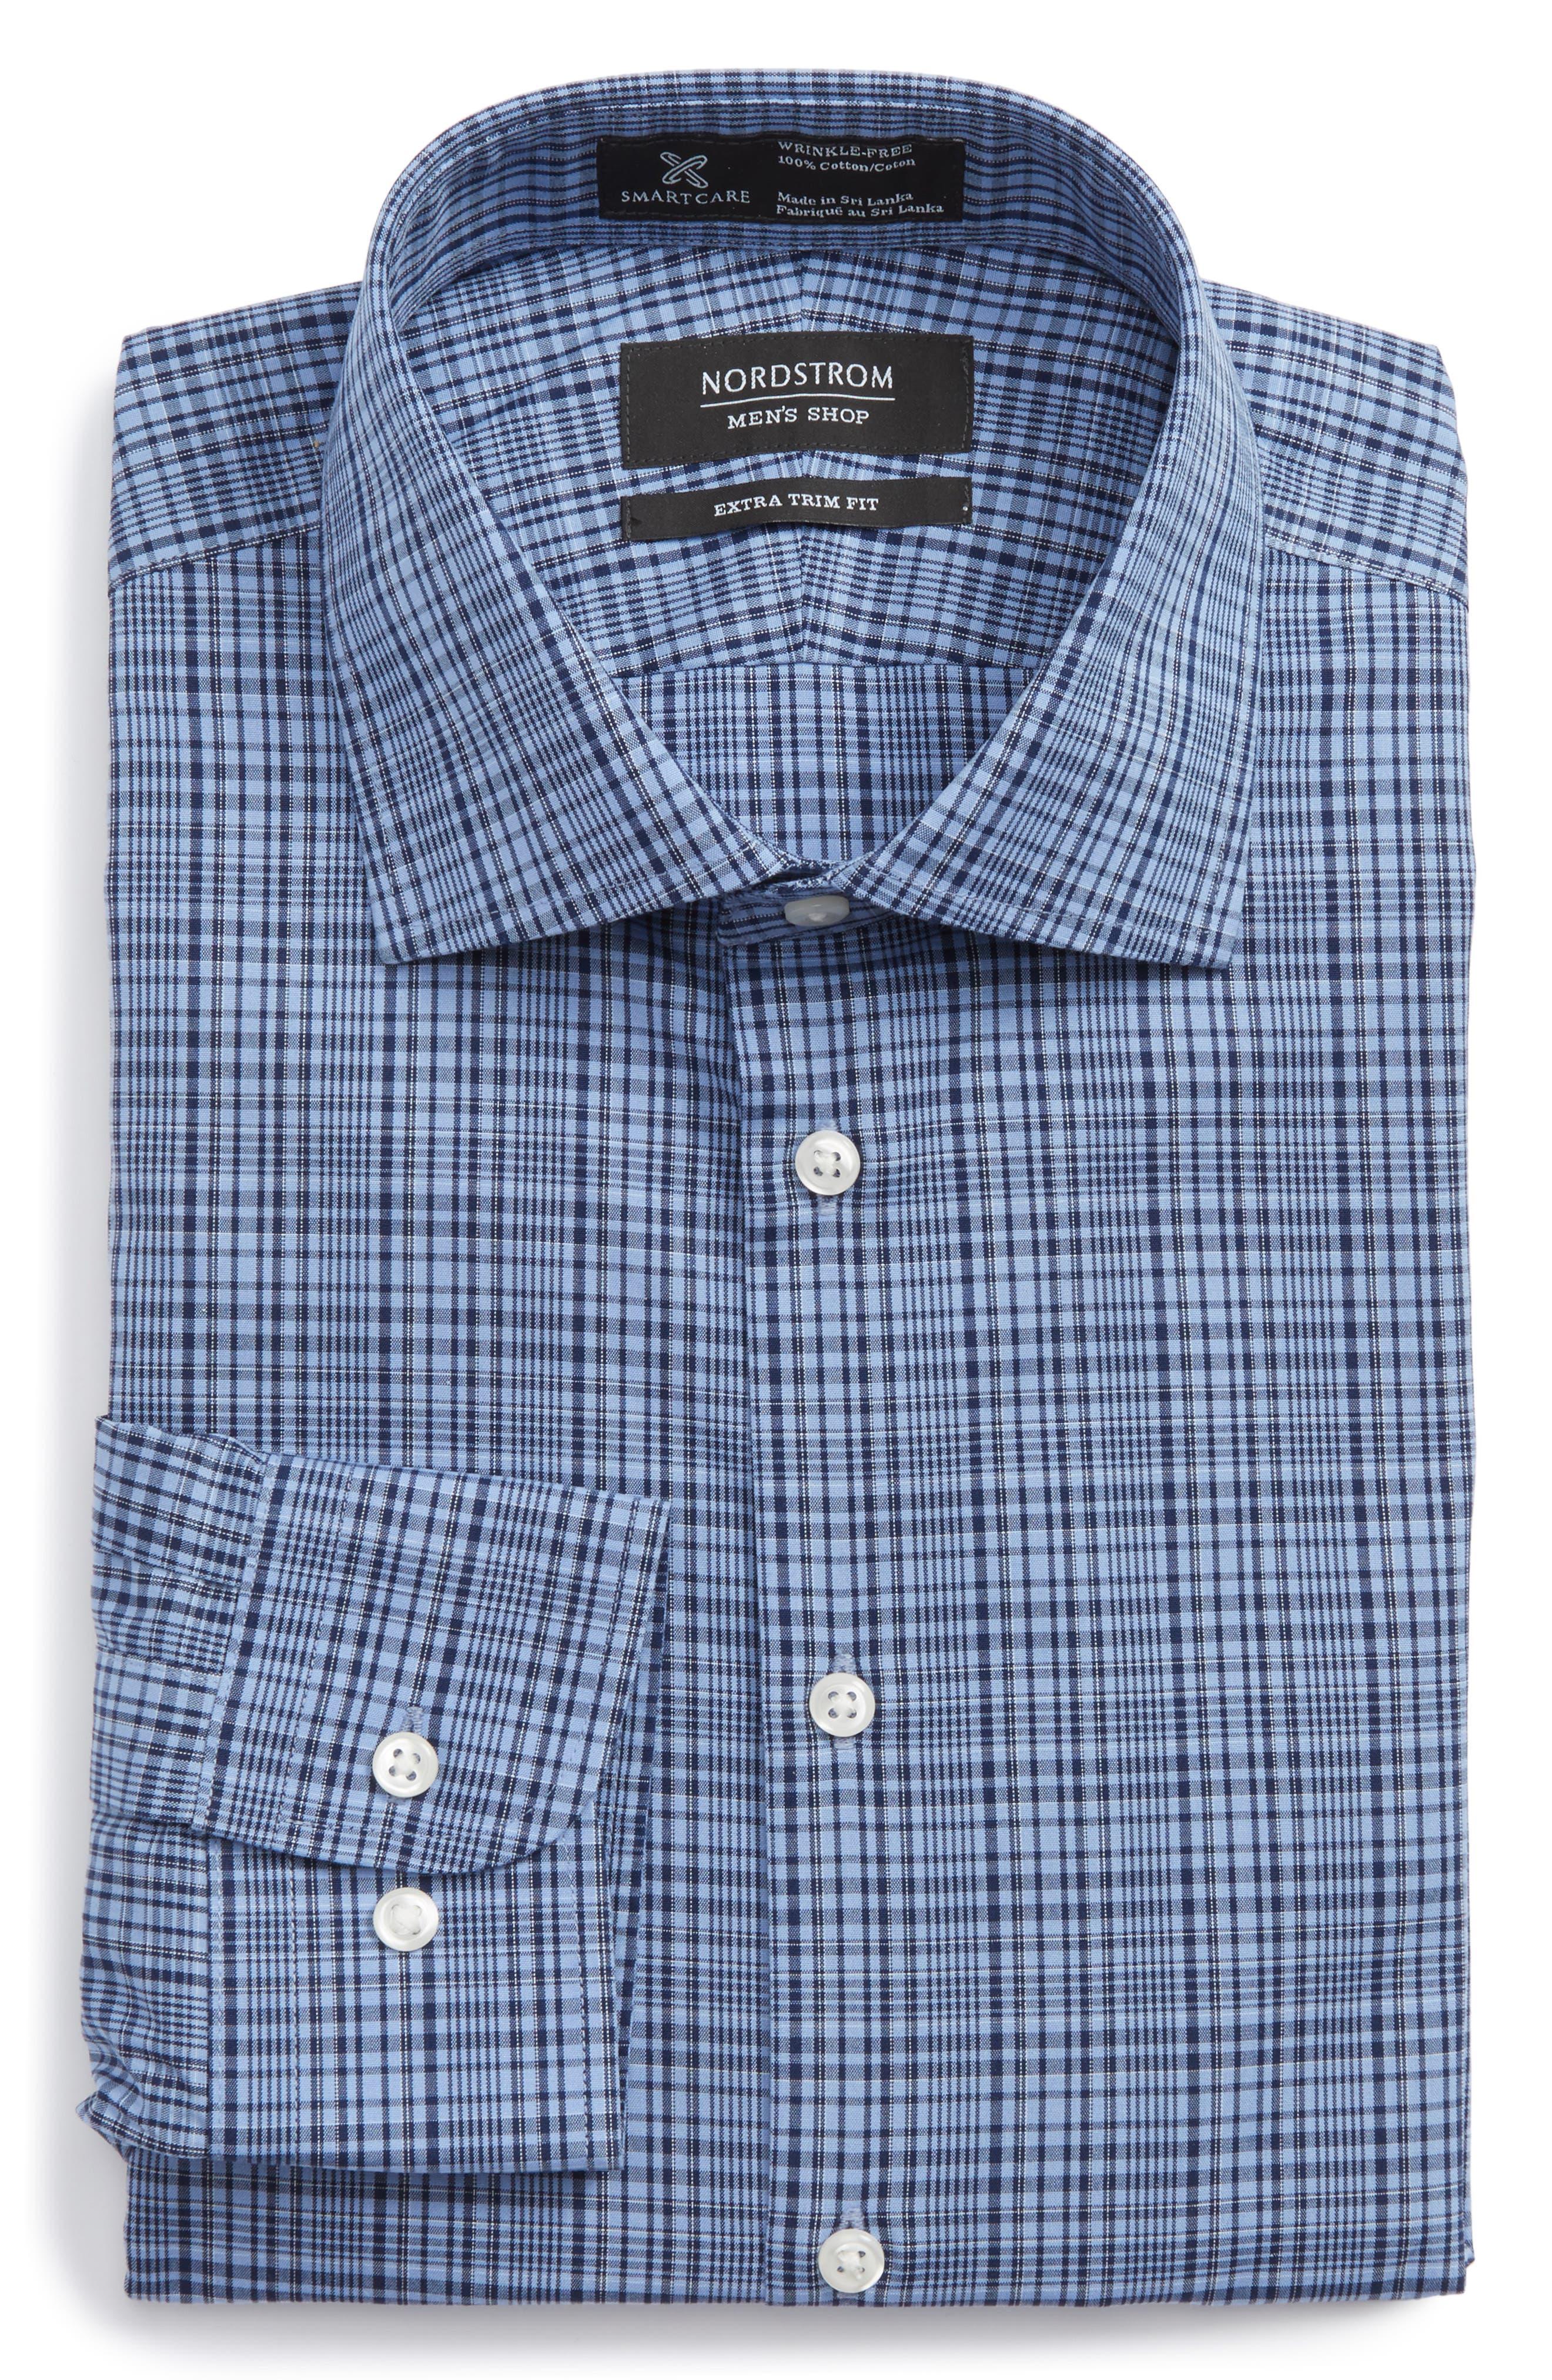 Alternate Image 1 Selected - Nordstrom Men's Shop Smartcare™ Extra Trim Fit Check Dress Shirt